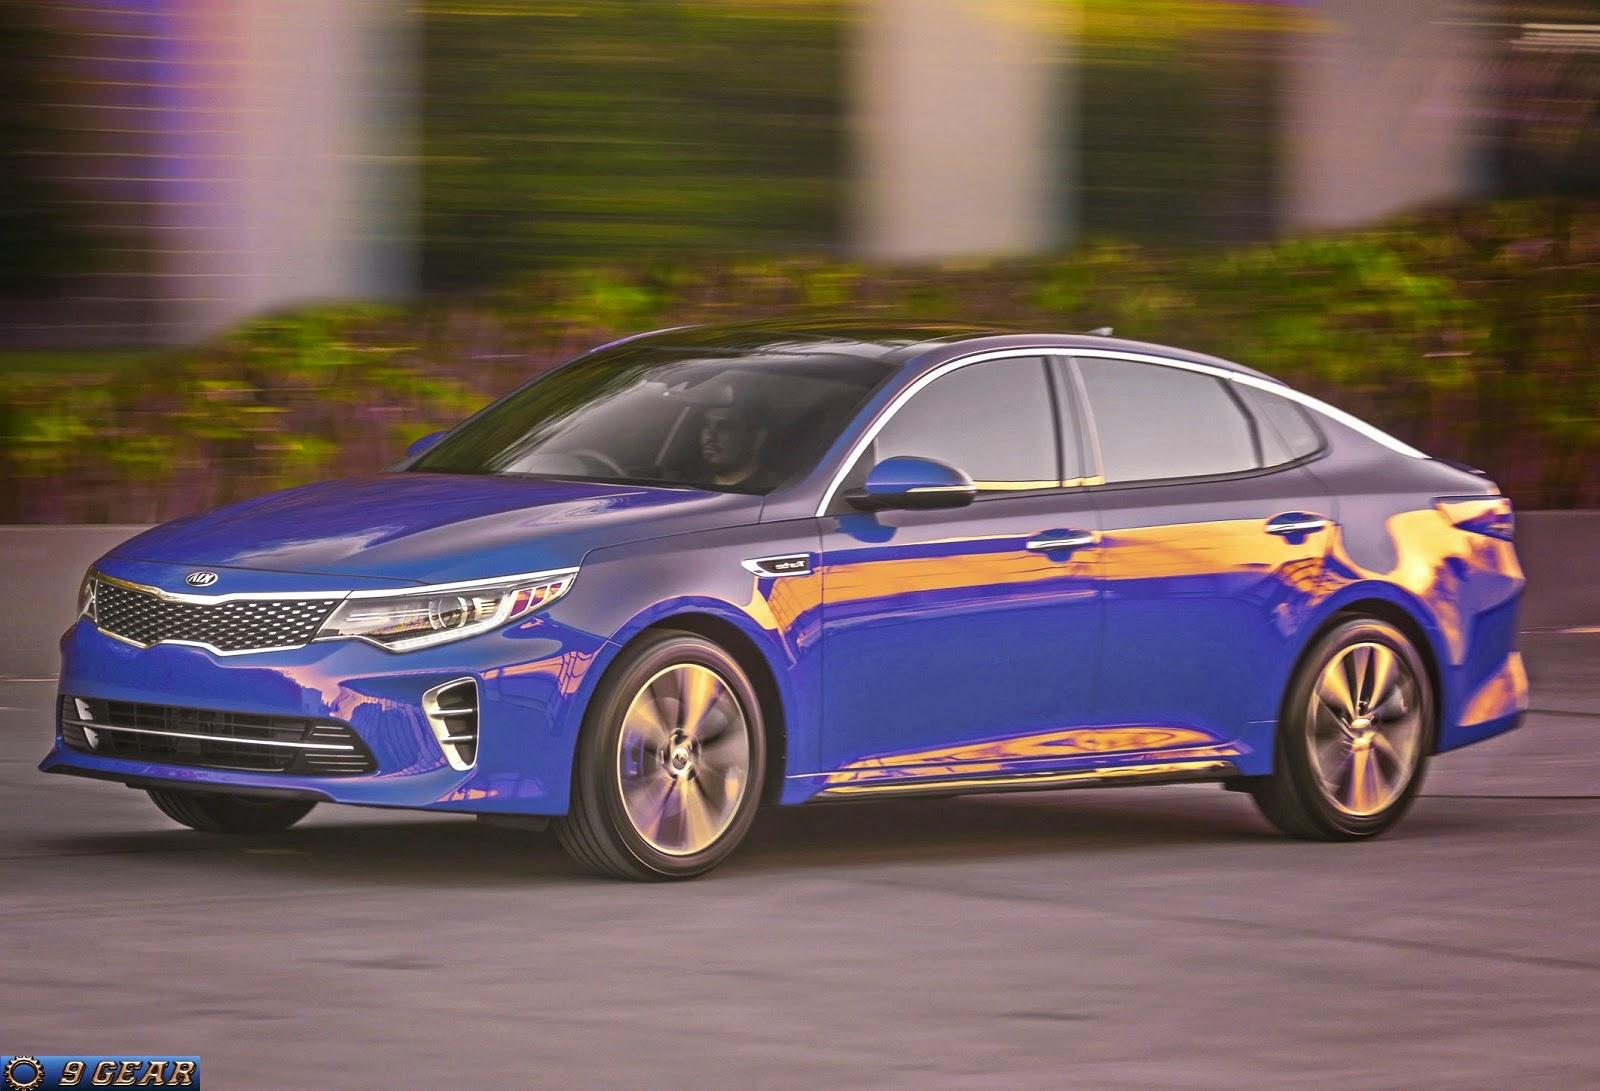 2016 kia optima 2 4 liter gdi 185 horsepower car reviews new car pictures for 2018 2019. Black Bedroom Furniture Sets. Home Design Ideas